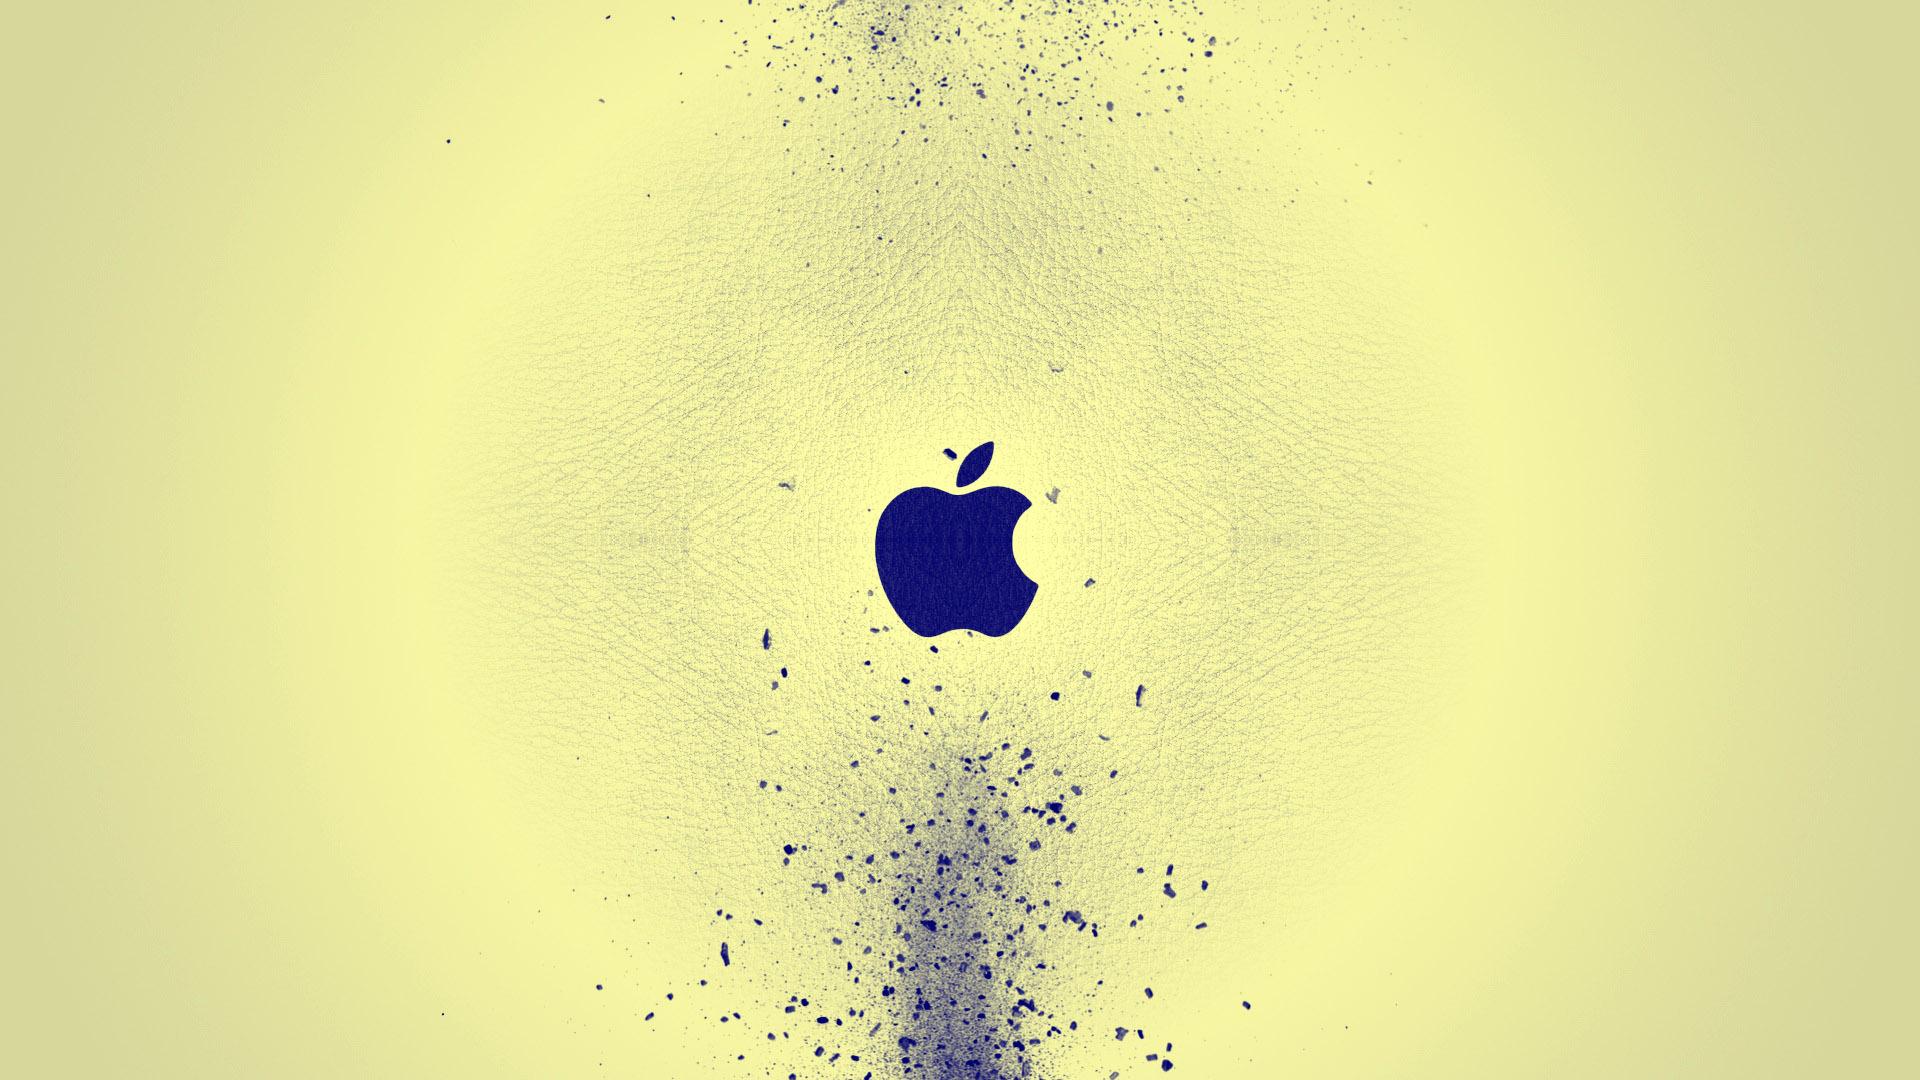 macbook pro 13 inch retina wallpaper size